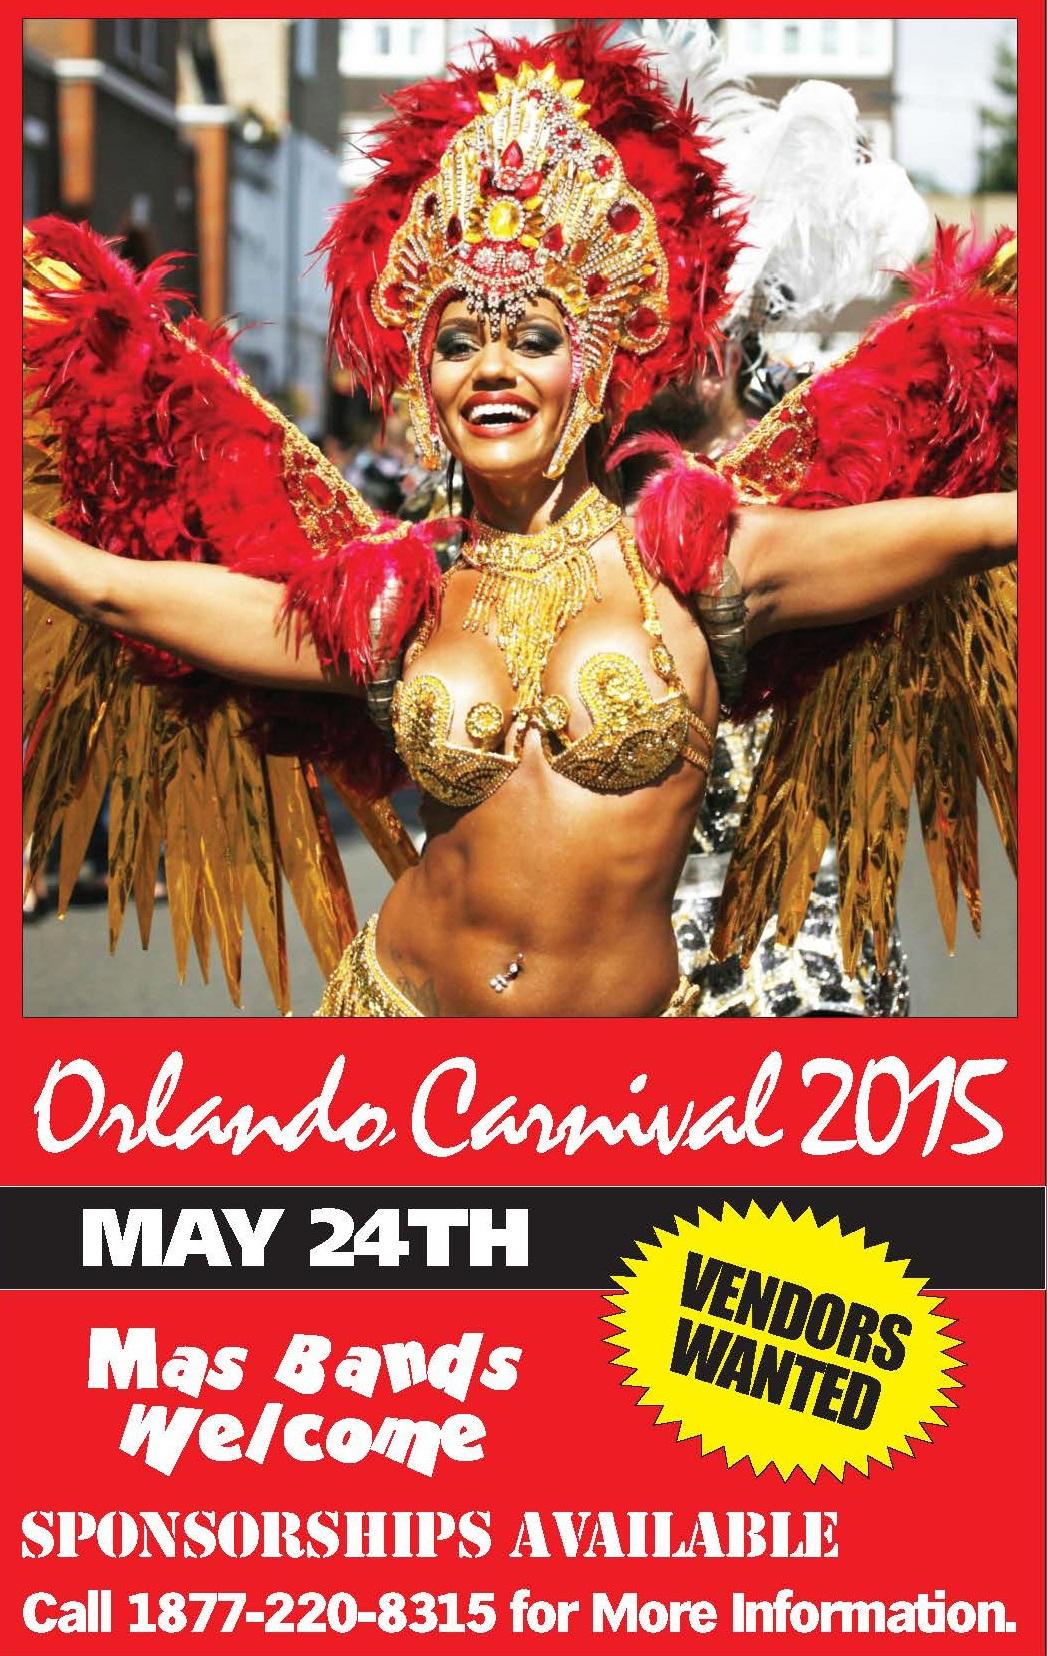 Orlando Carnival 2015